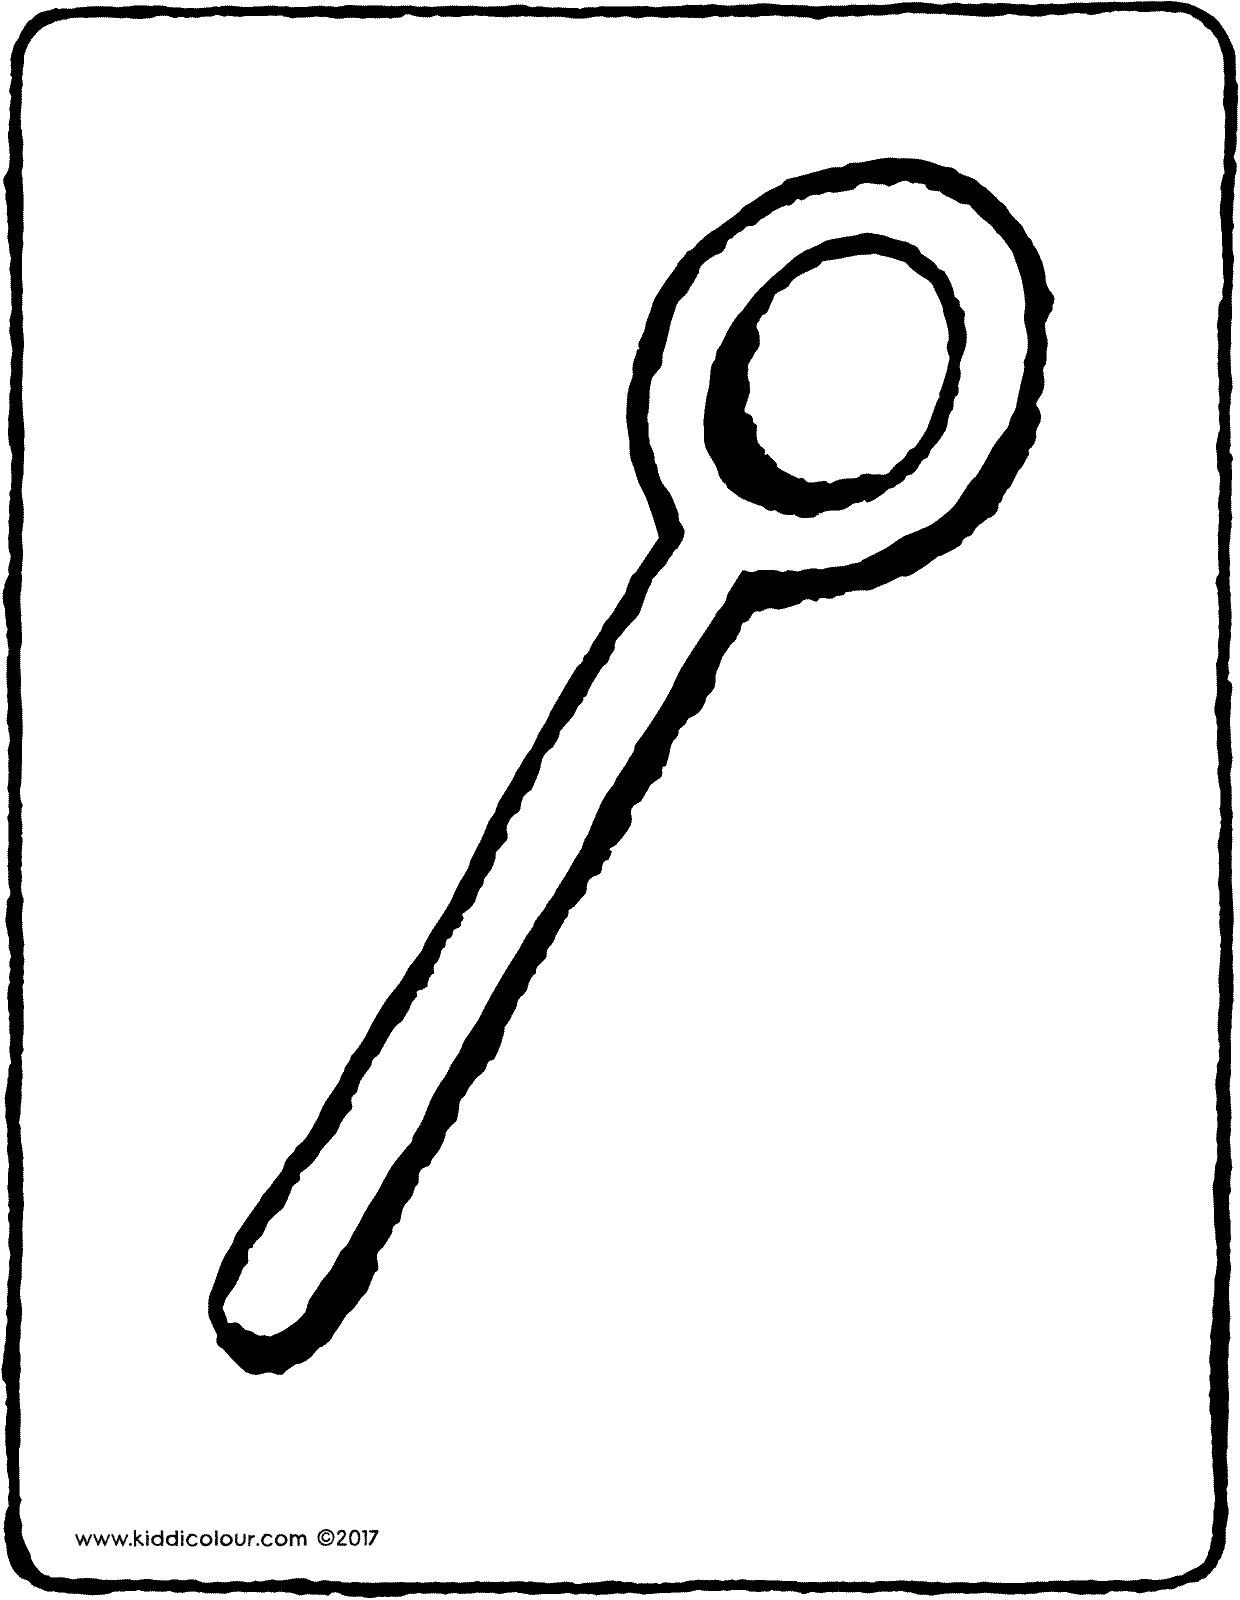 1240x1600 Wooden Spoon